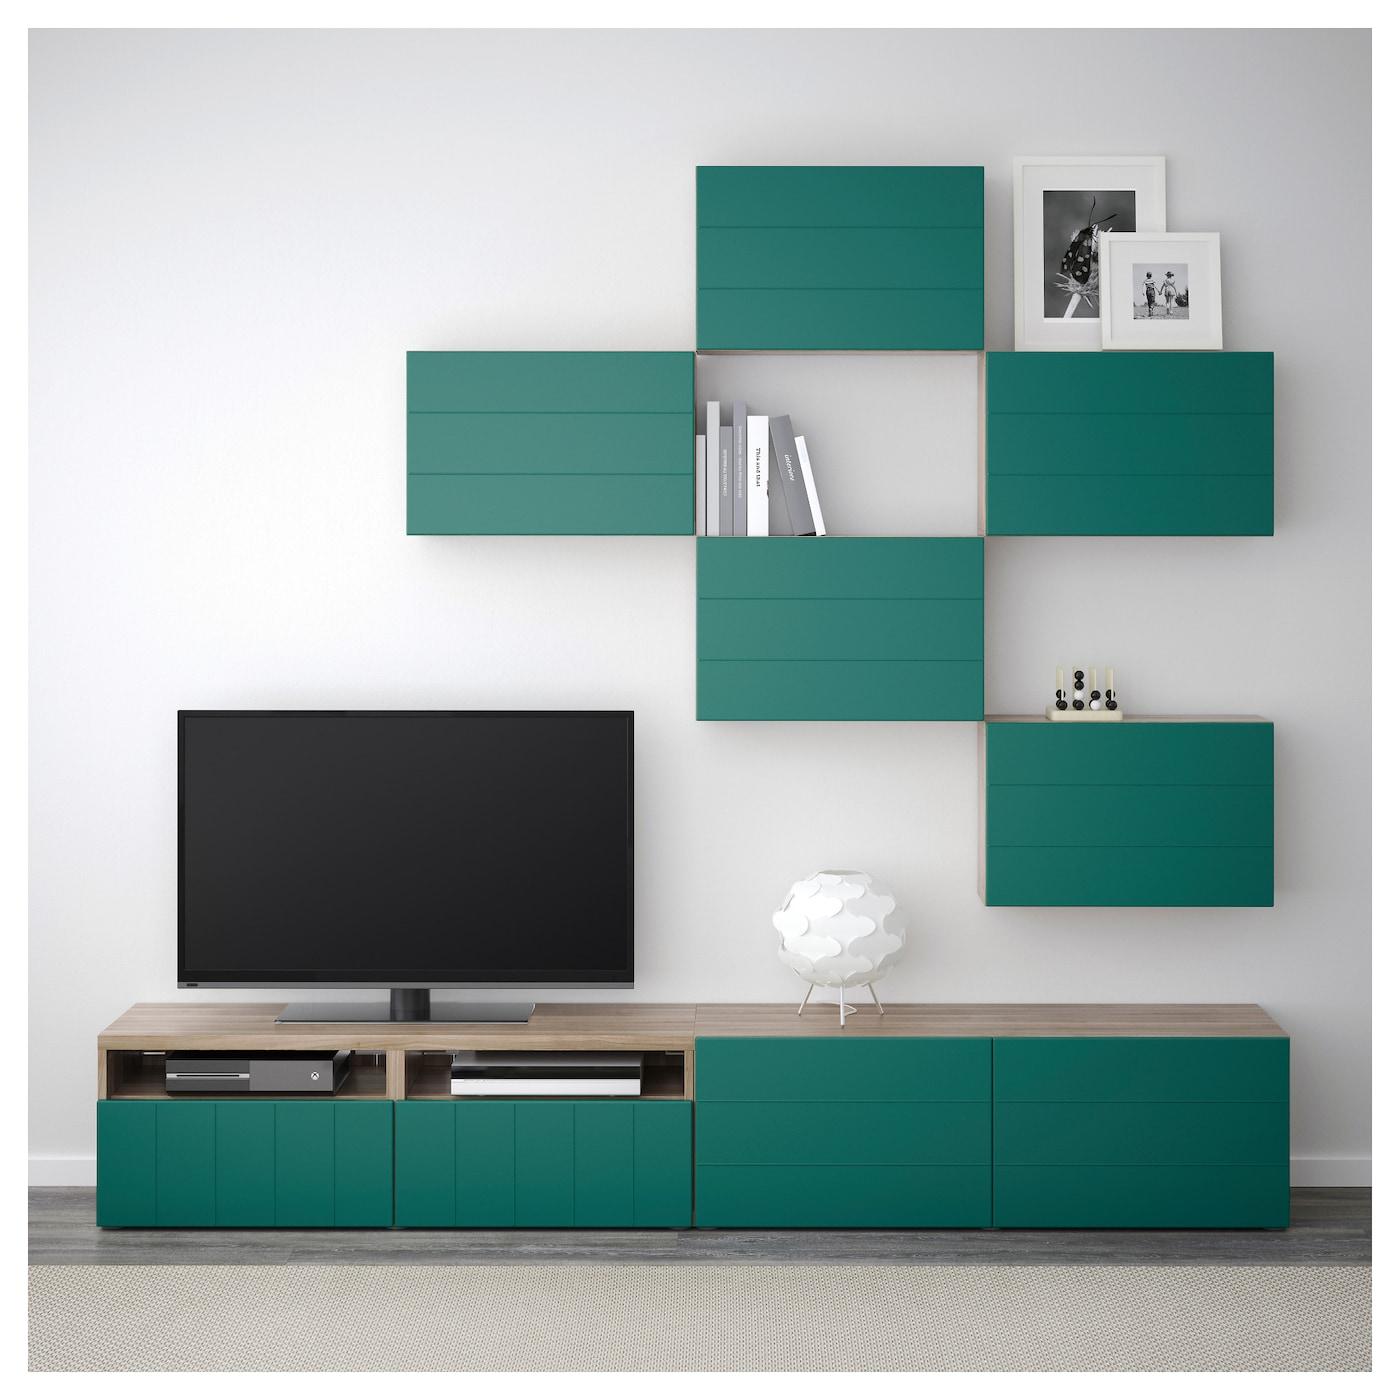 Best Combinaison Meuble Tv Motif Noyer Teint Gris Hallstavik  # Meuble Tv Vert